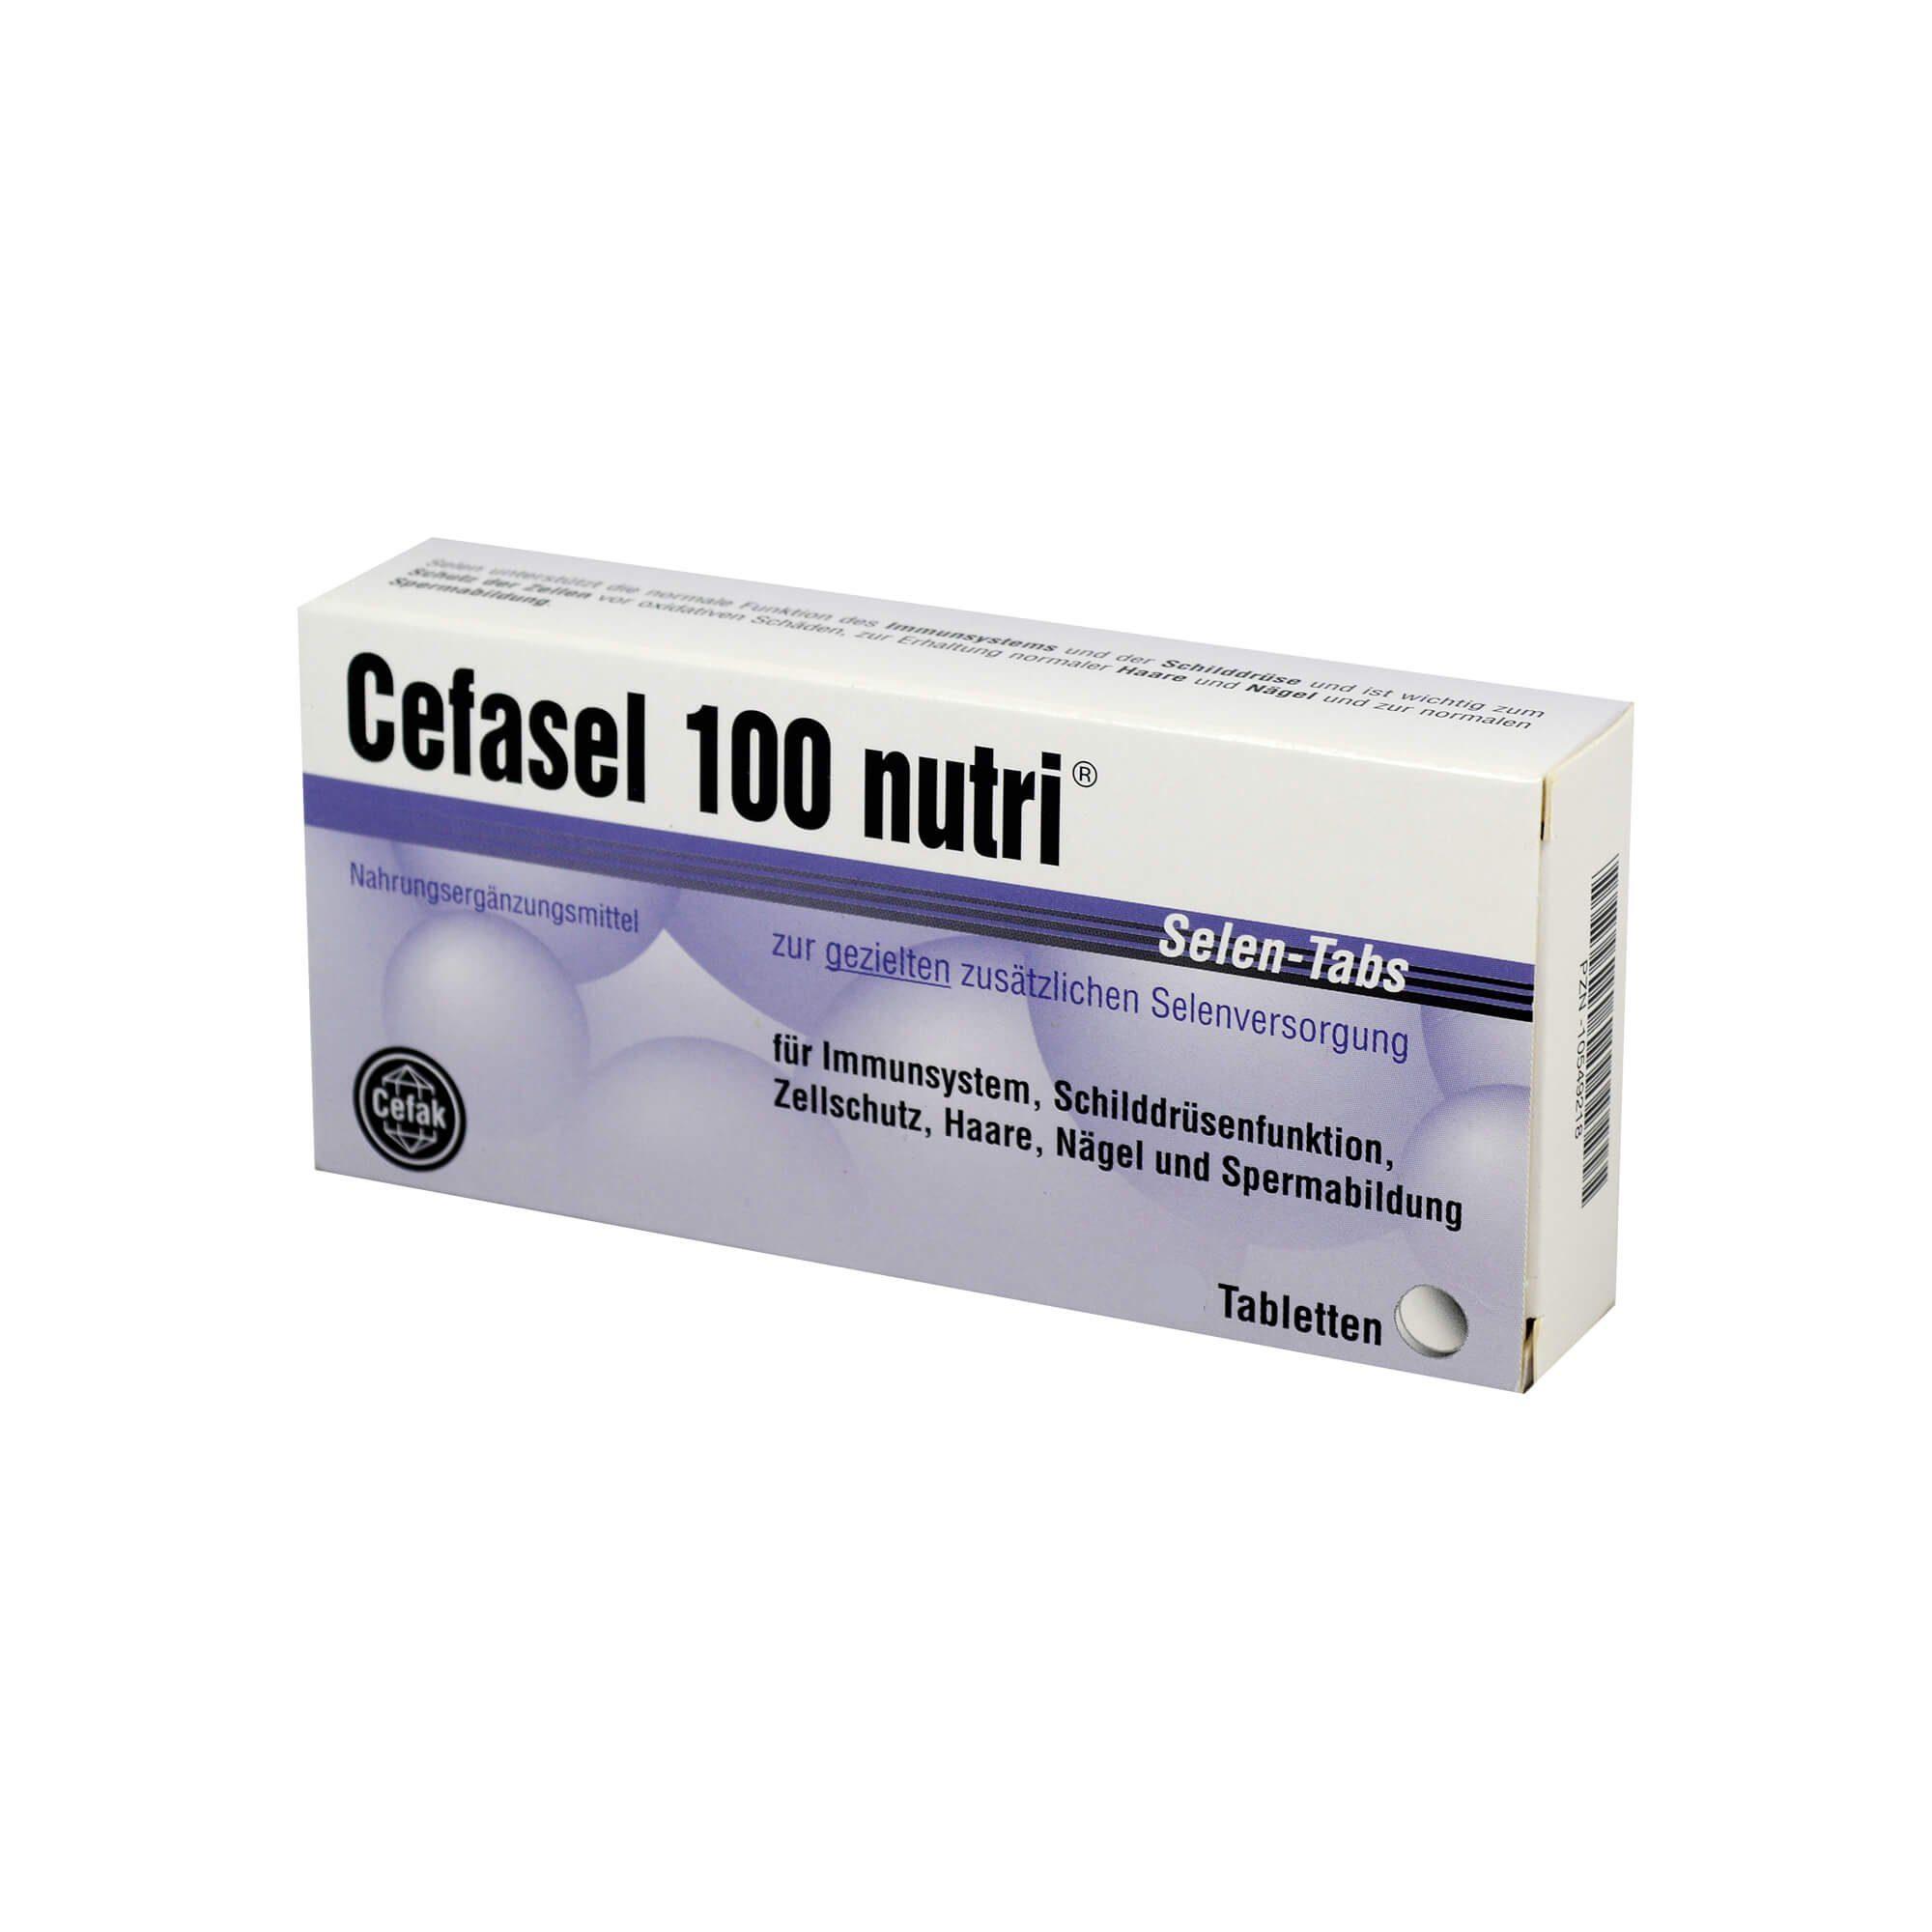 Cefasel 100 Nutri Selen-Tabs , 200 St